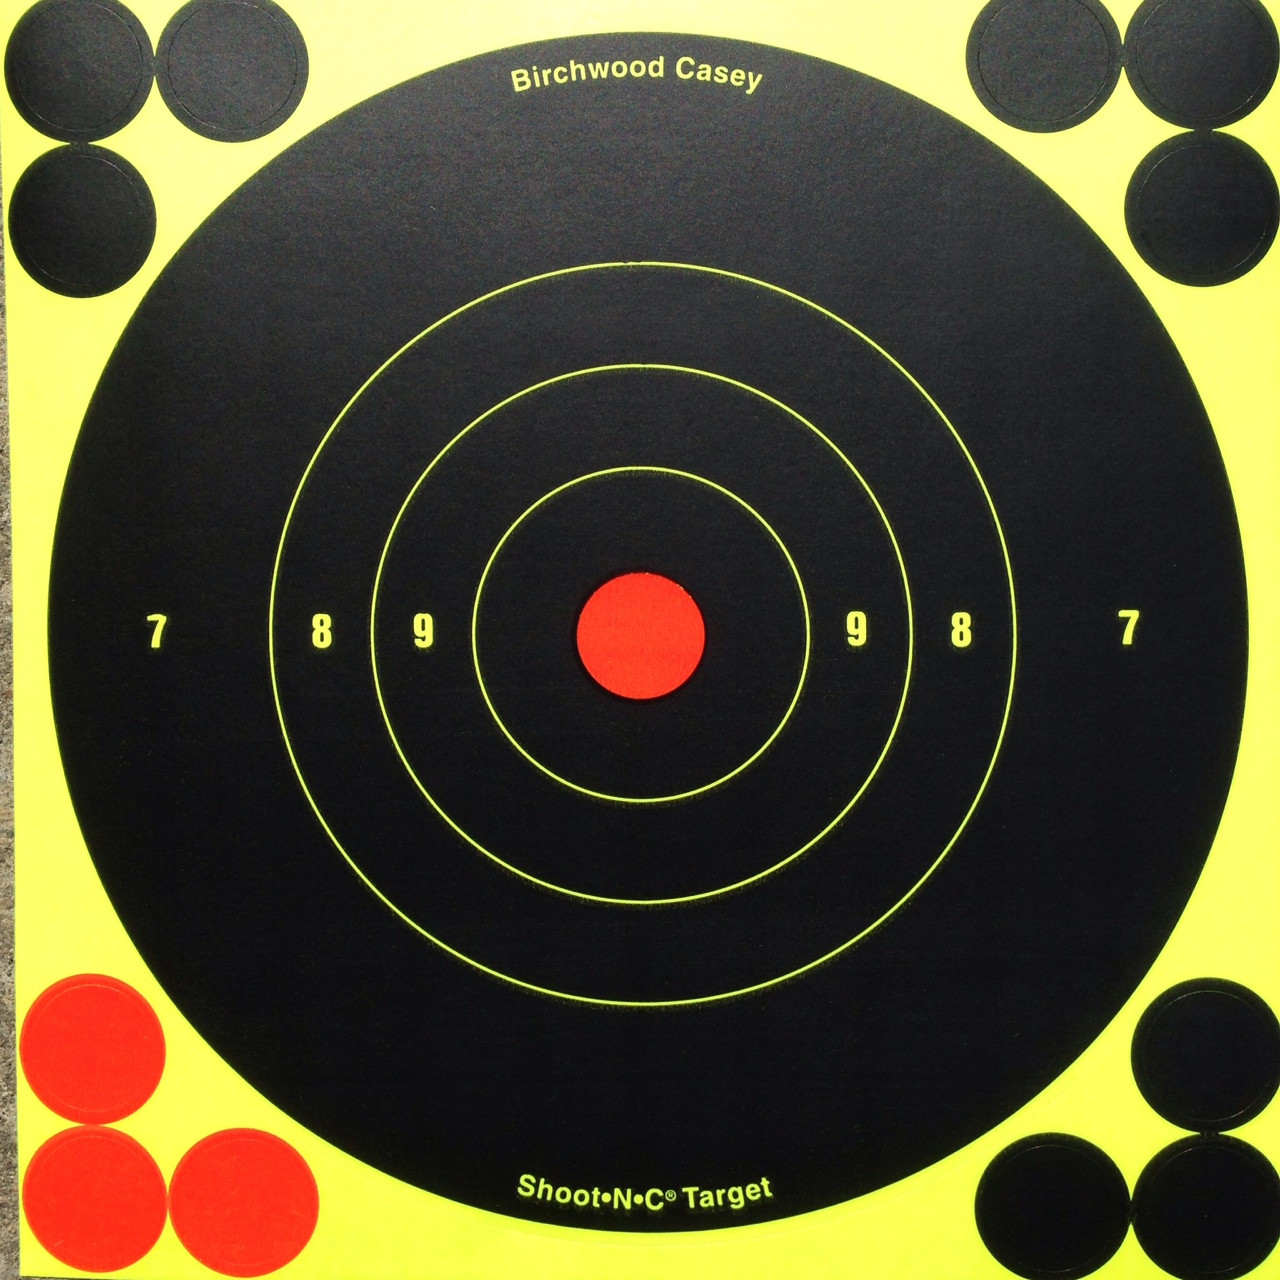 "Shoot-N-C 6"" Reactive Shooting Target"